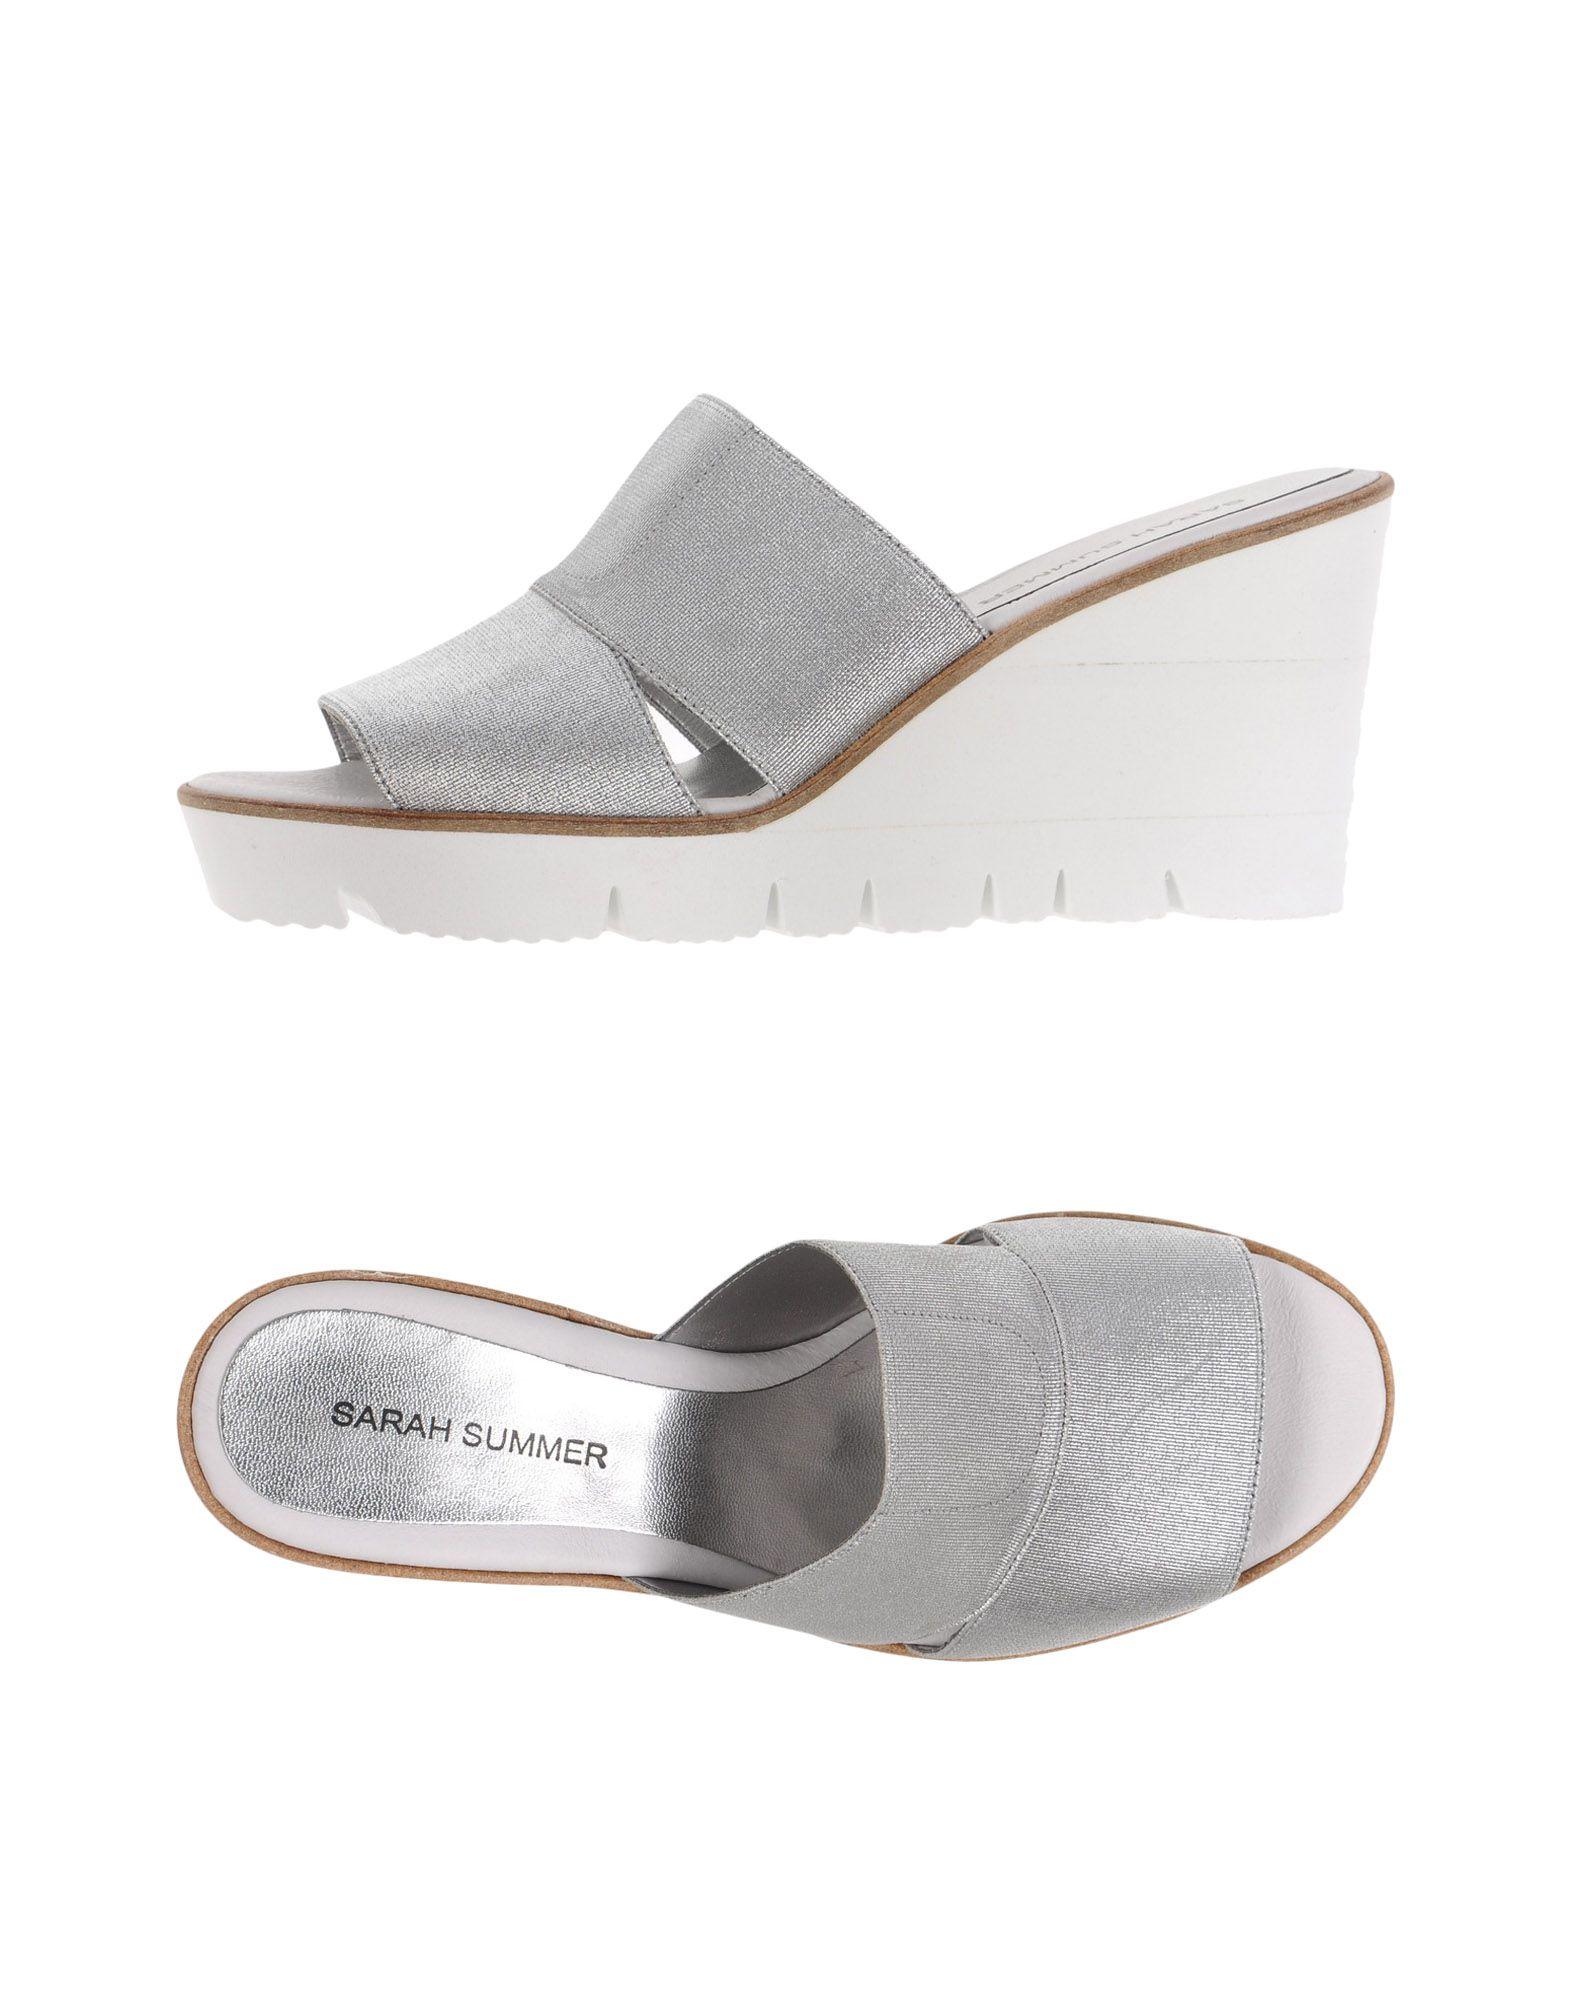 SARAH SUMMER Sandals in Silver